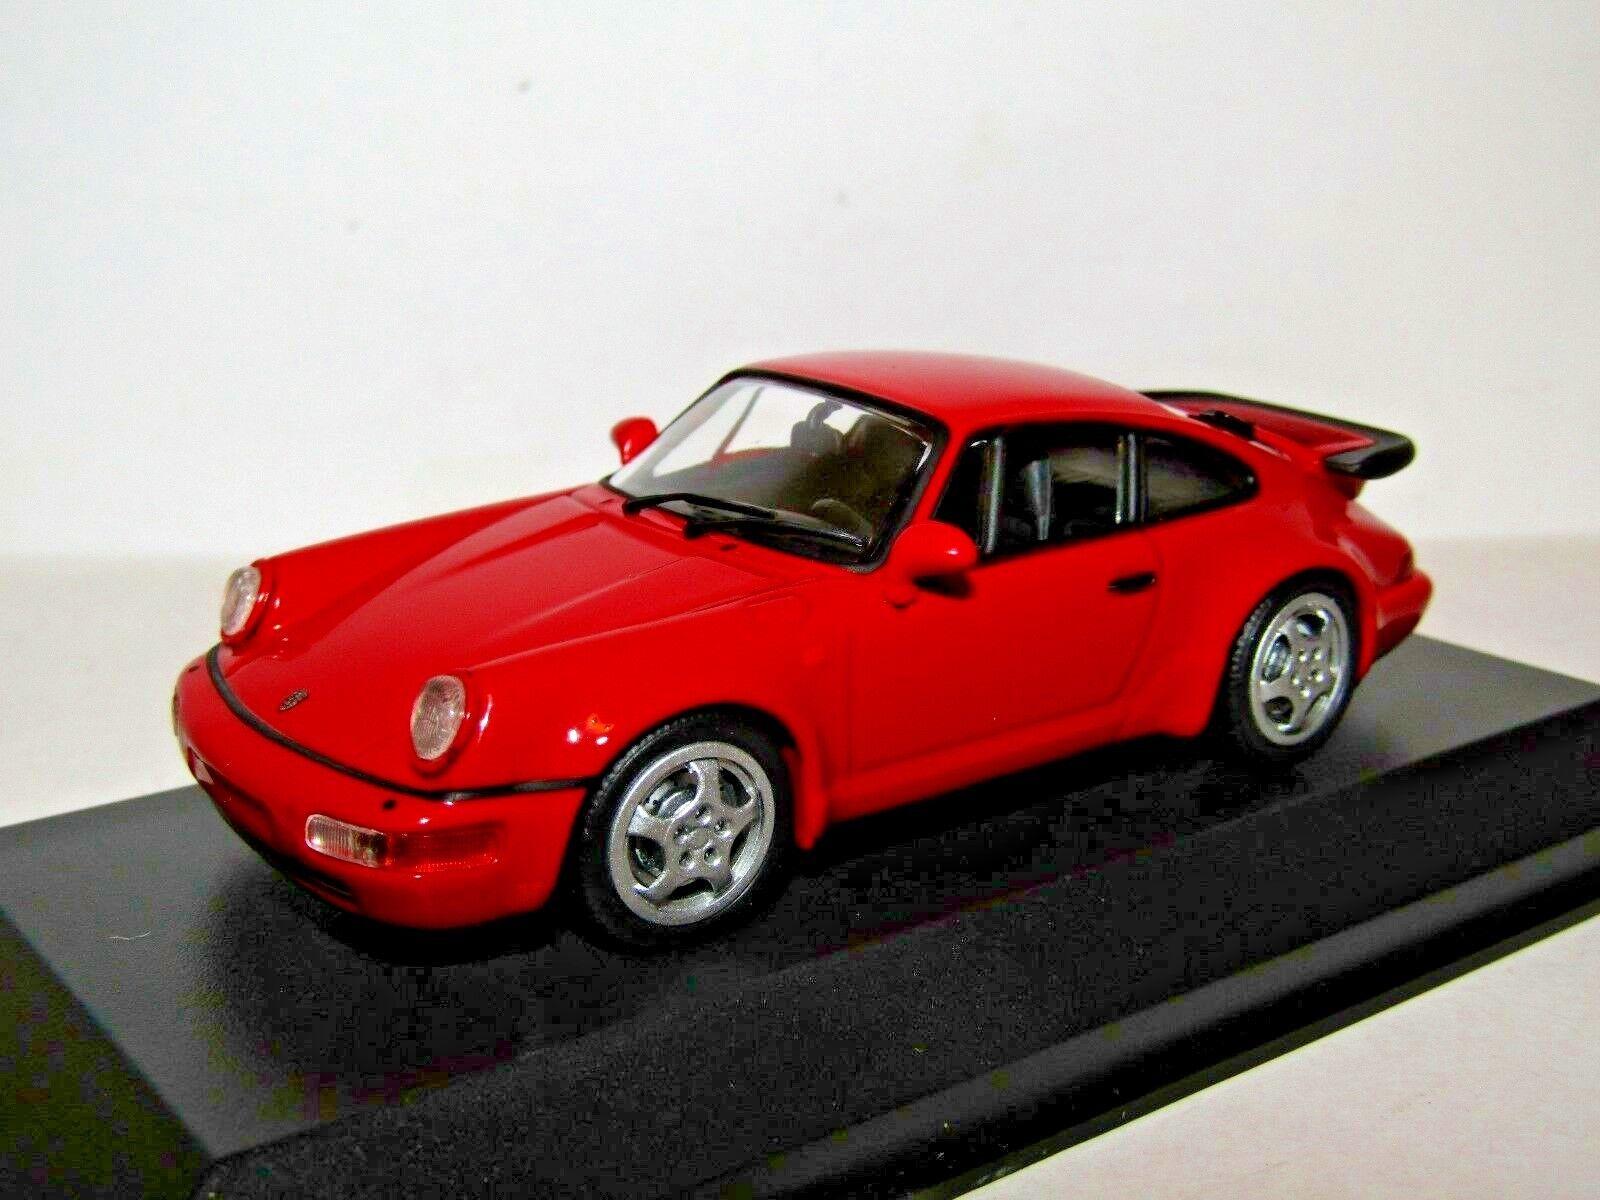 MAXICHAMPS PORSCHE 911 TURBO (964) 1990 RED 1 43